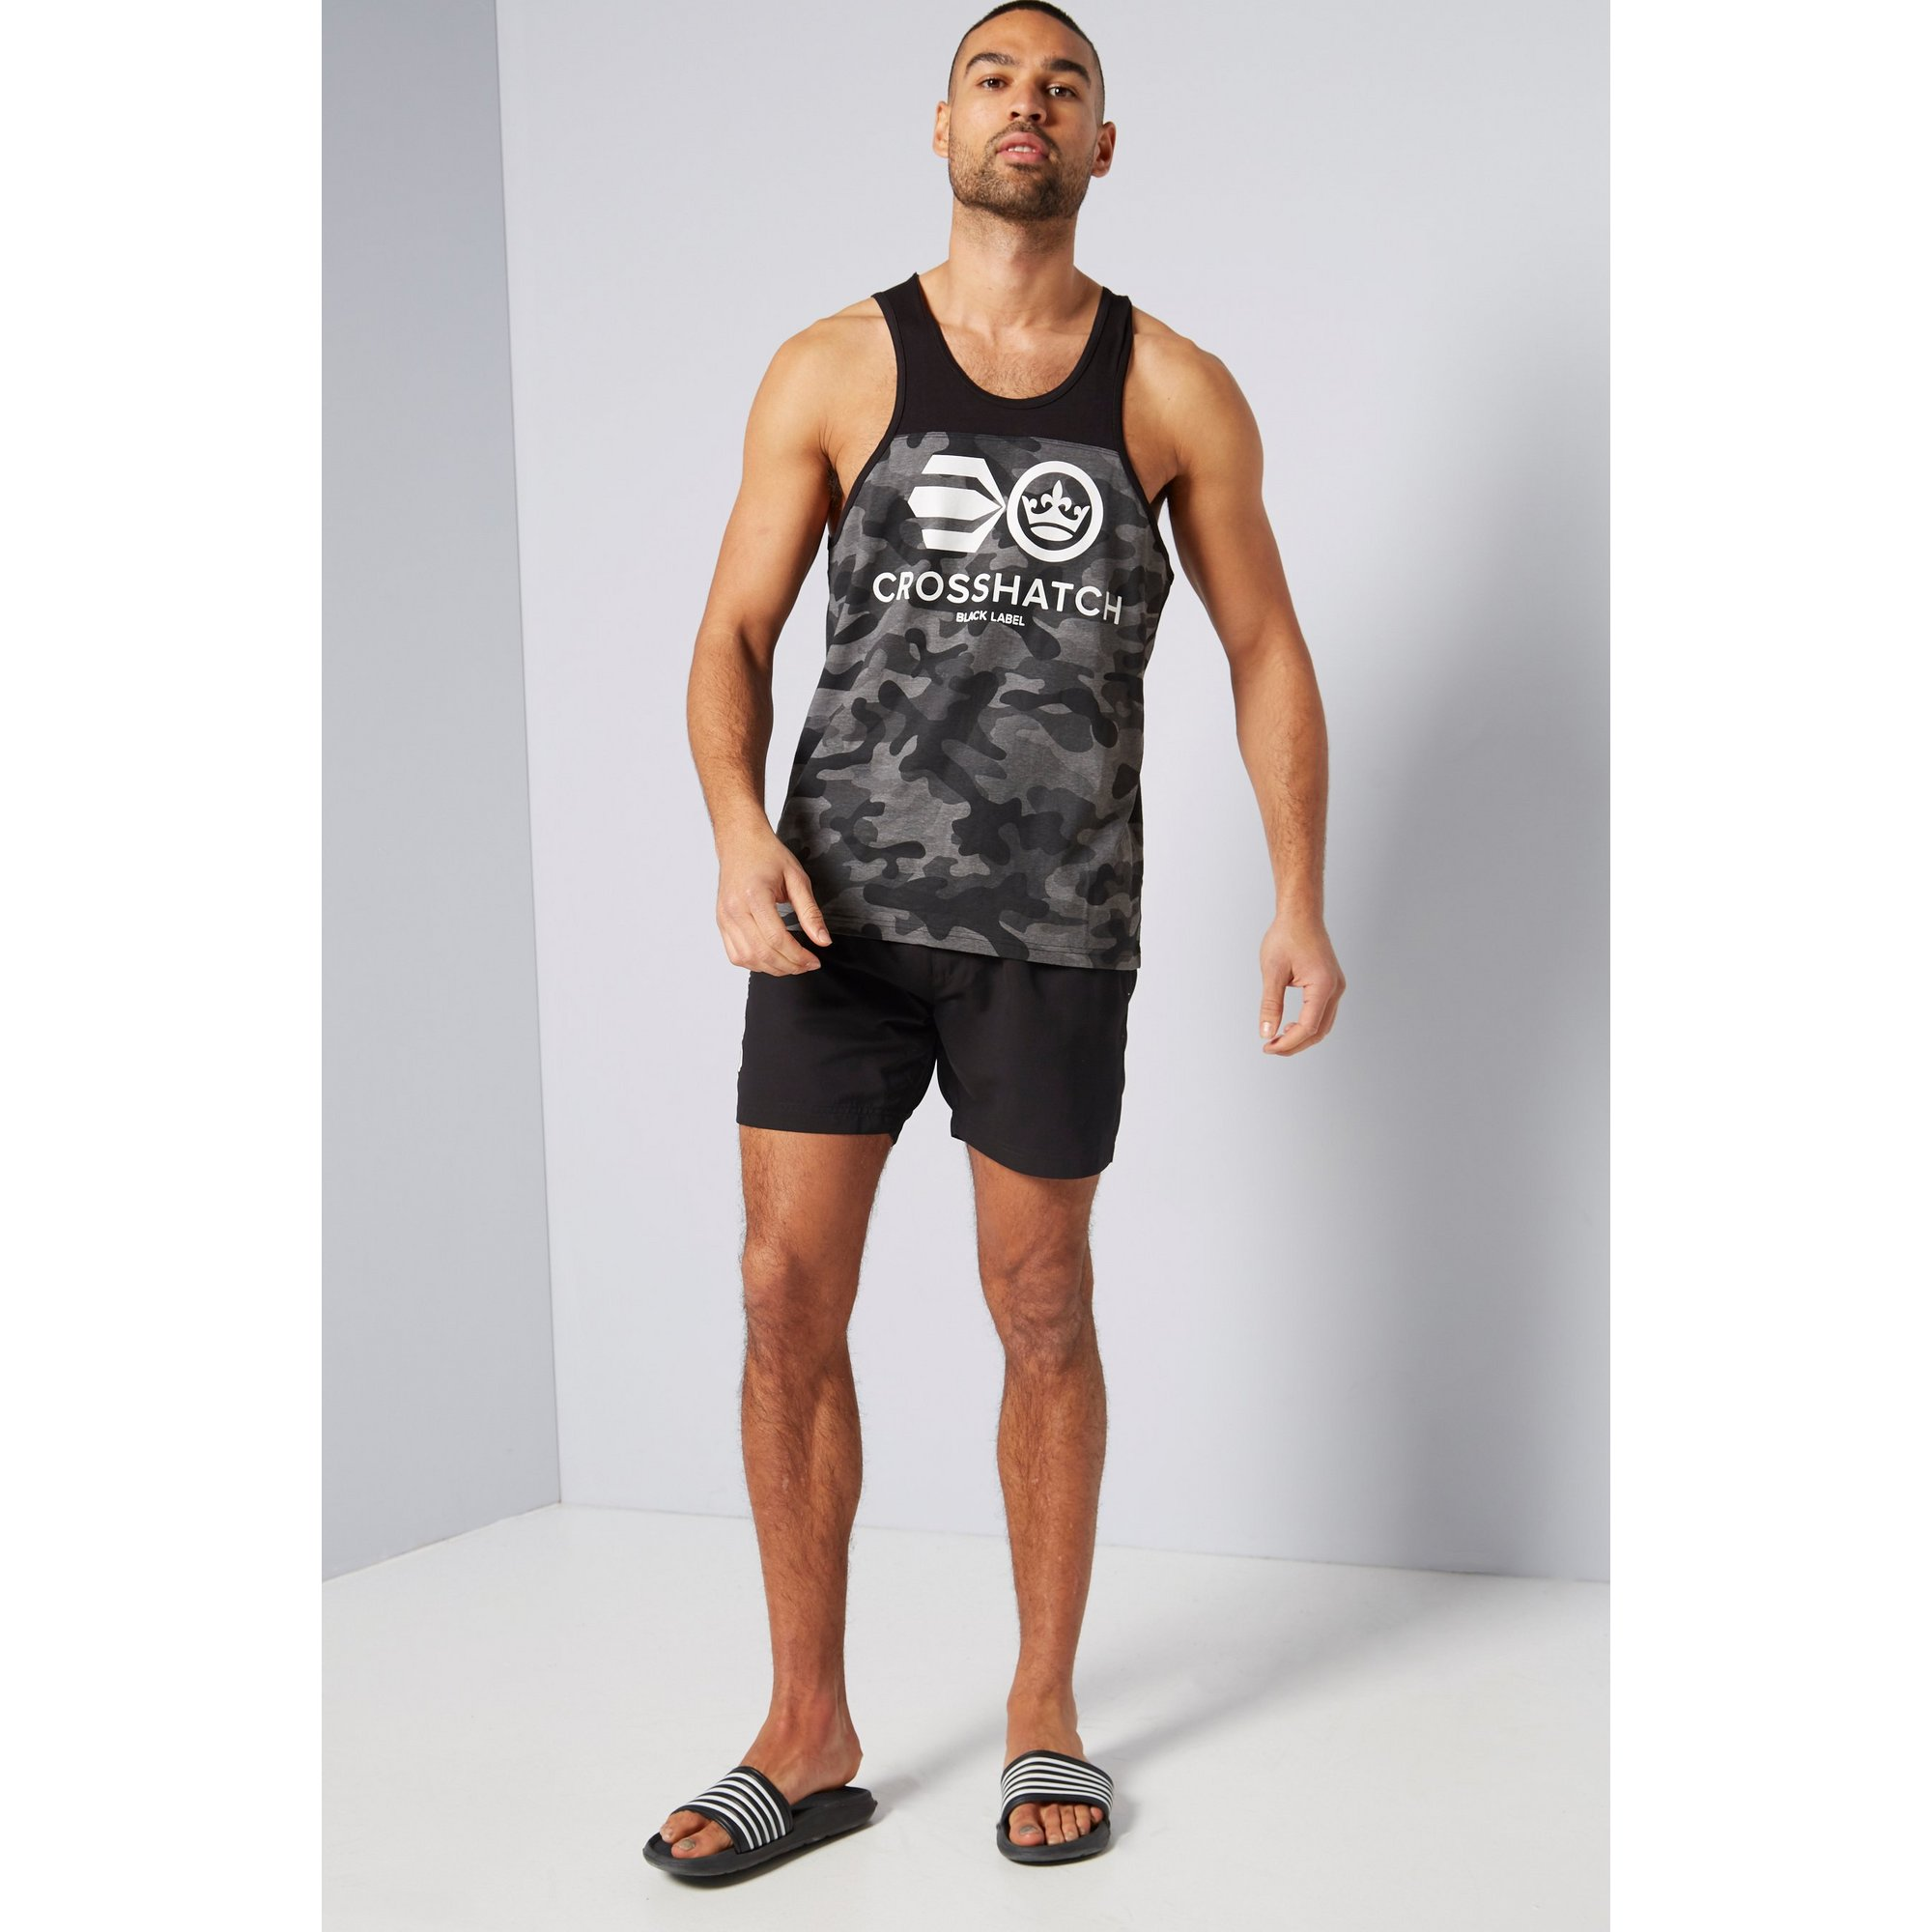 Image of Crosshatch Black Camo Vest and Shorts Set